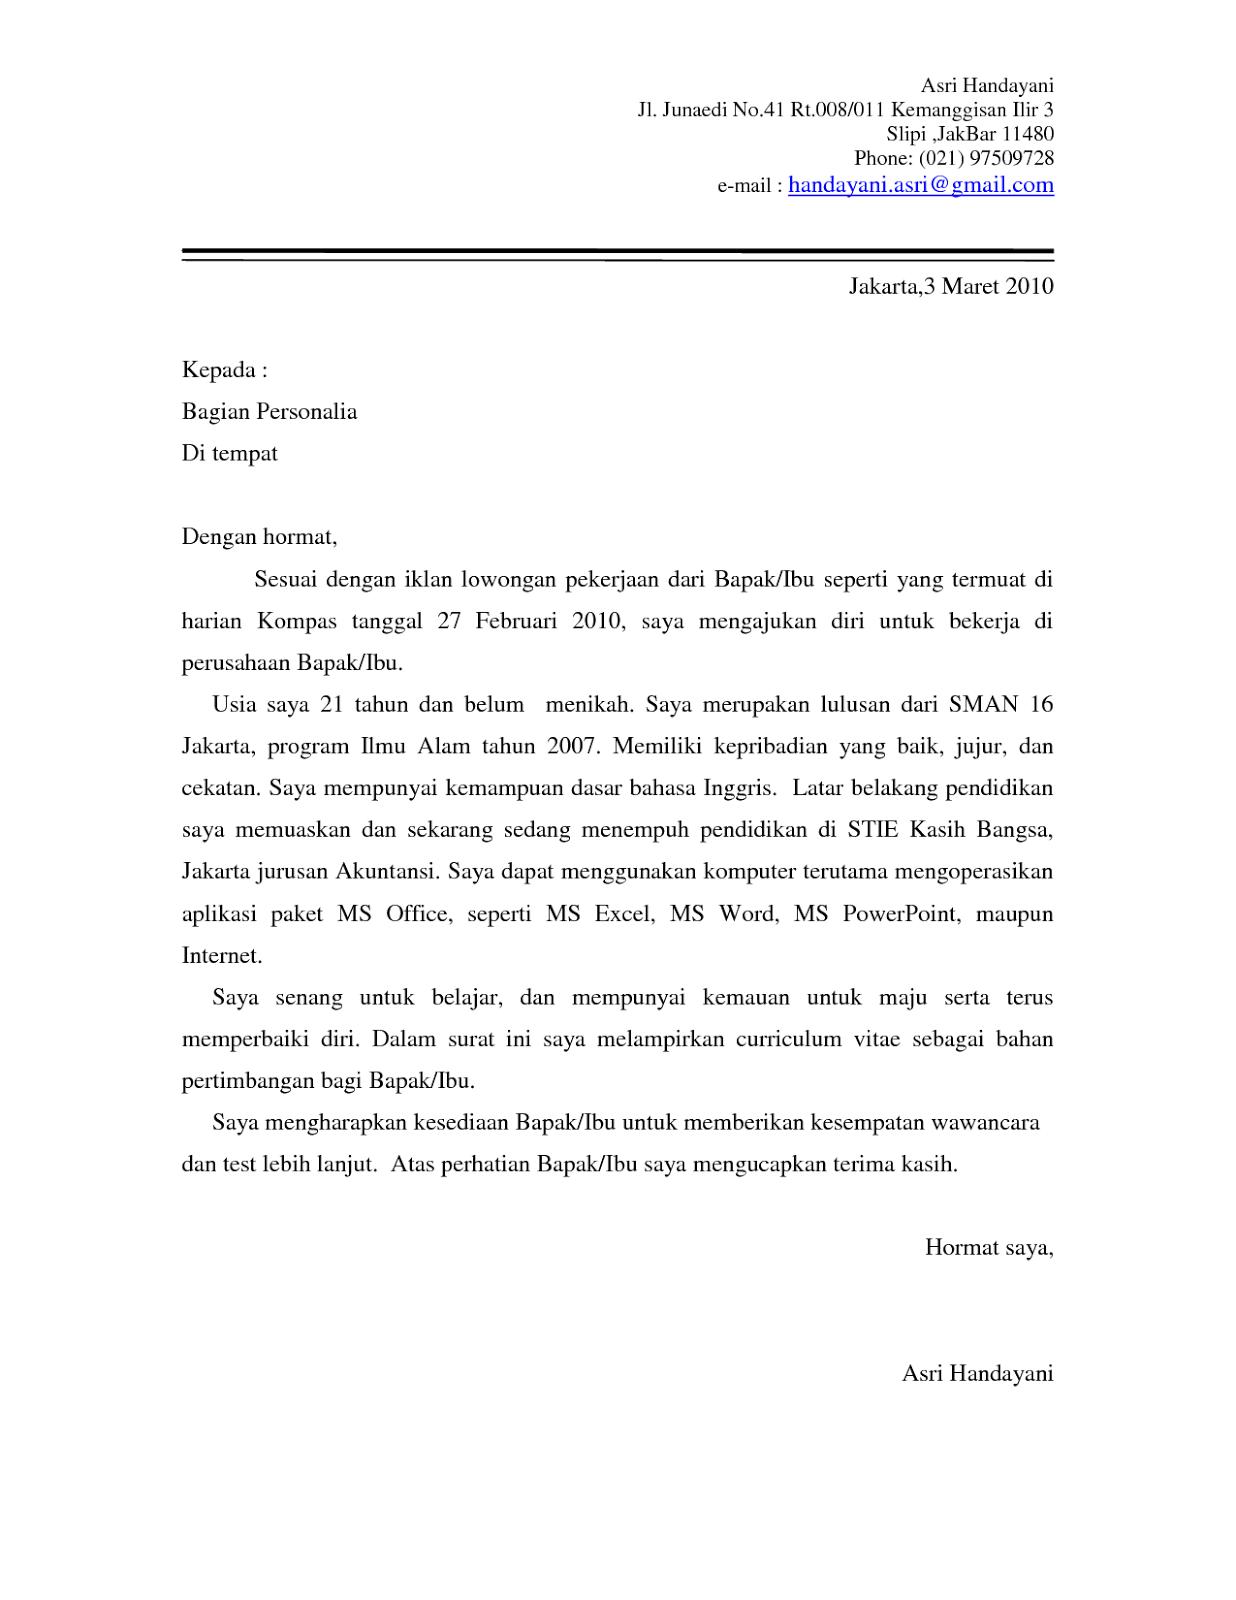 Contoh Surat Lamaran Kerja Sebagai Staff Administrasi Cute766